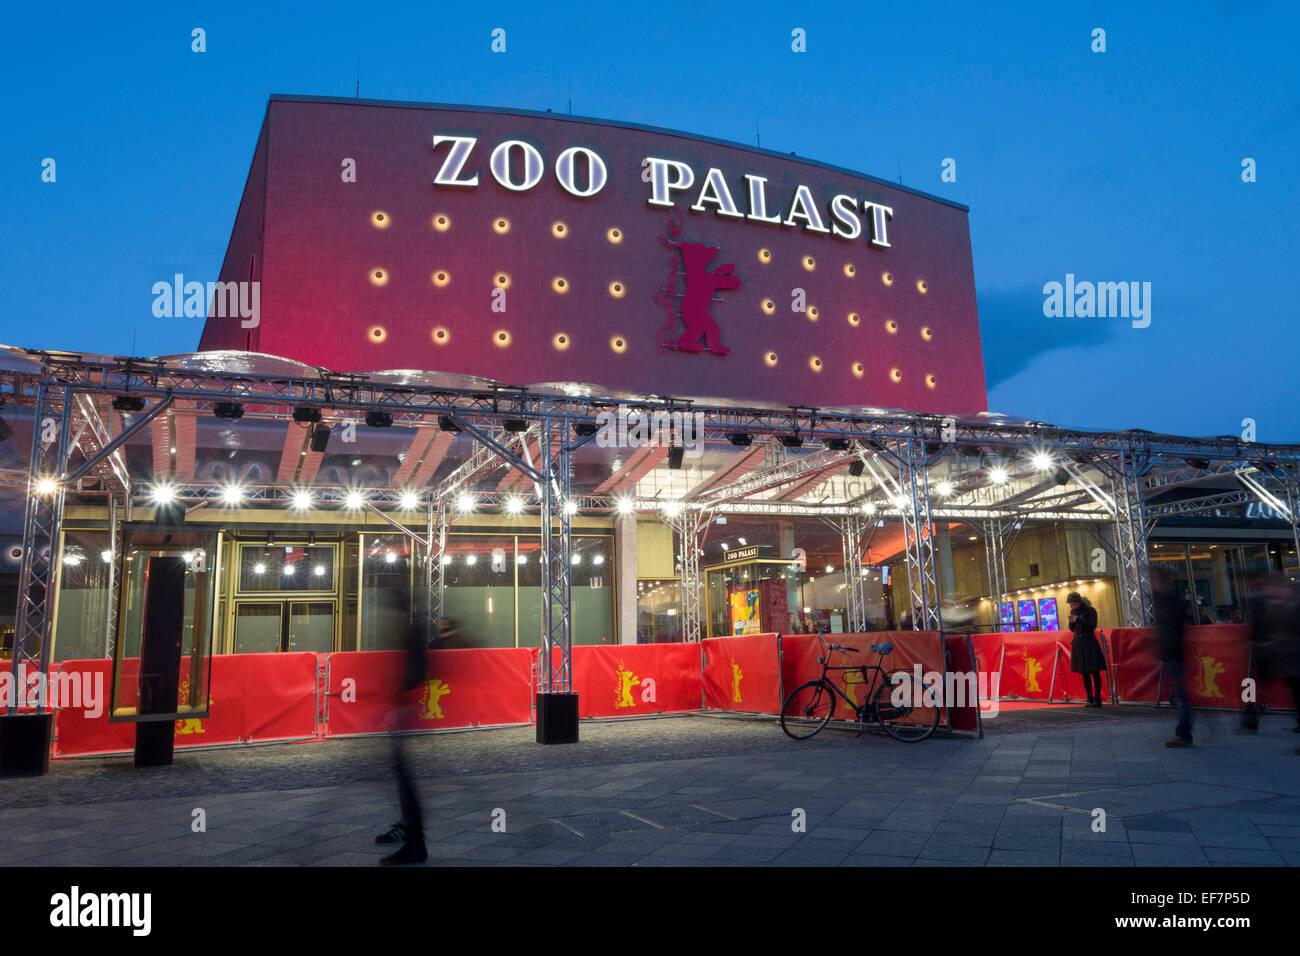 Zoo Palast, Berlinale, Berlin, Germany Stock Photo